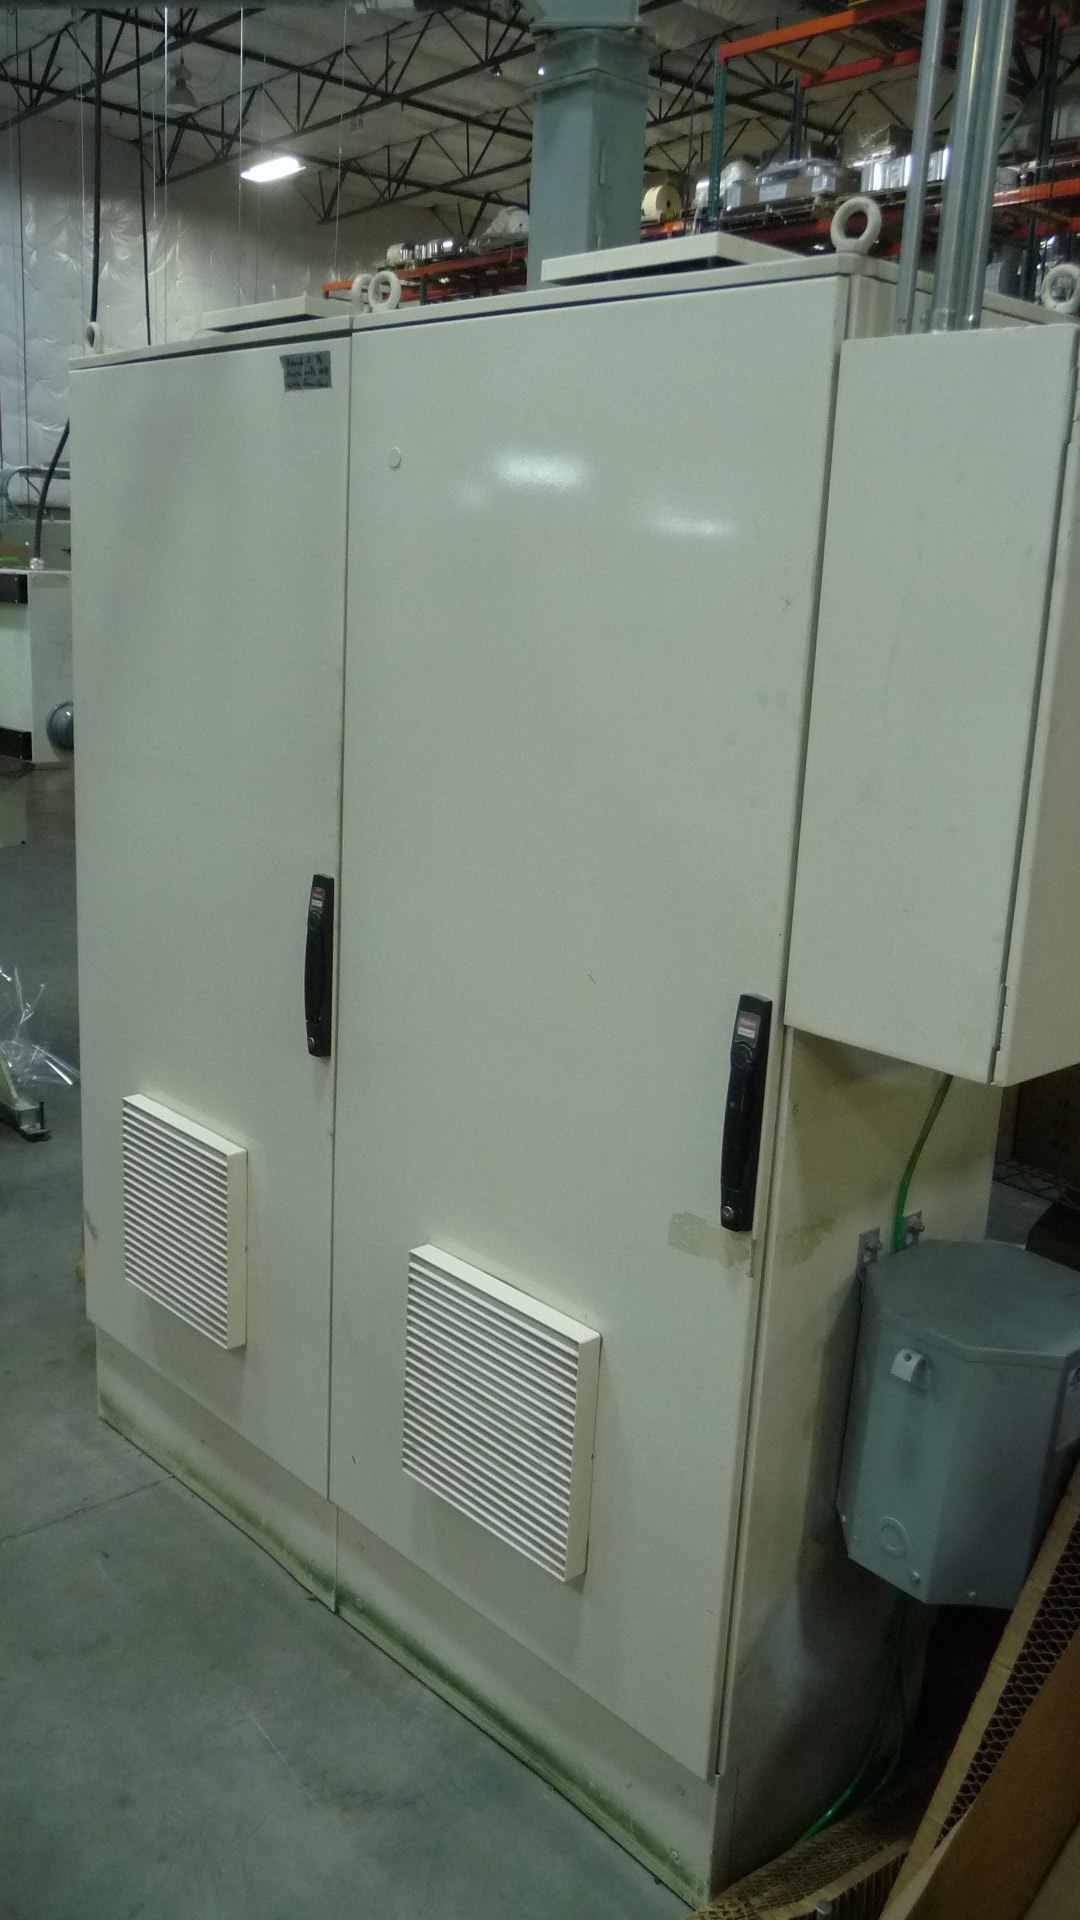 Comco Proglide MSP - Used Flexo Printing Presses and Used Flexographic Equipment-9